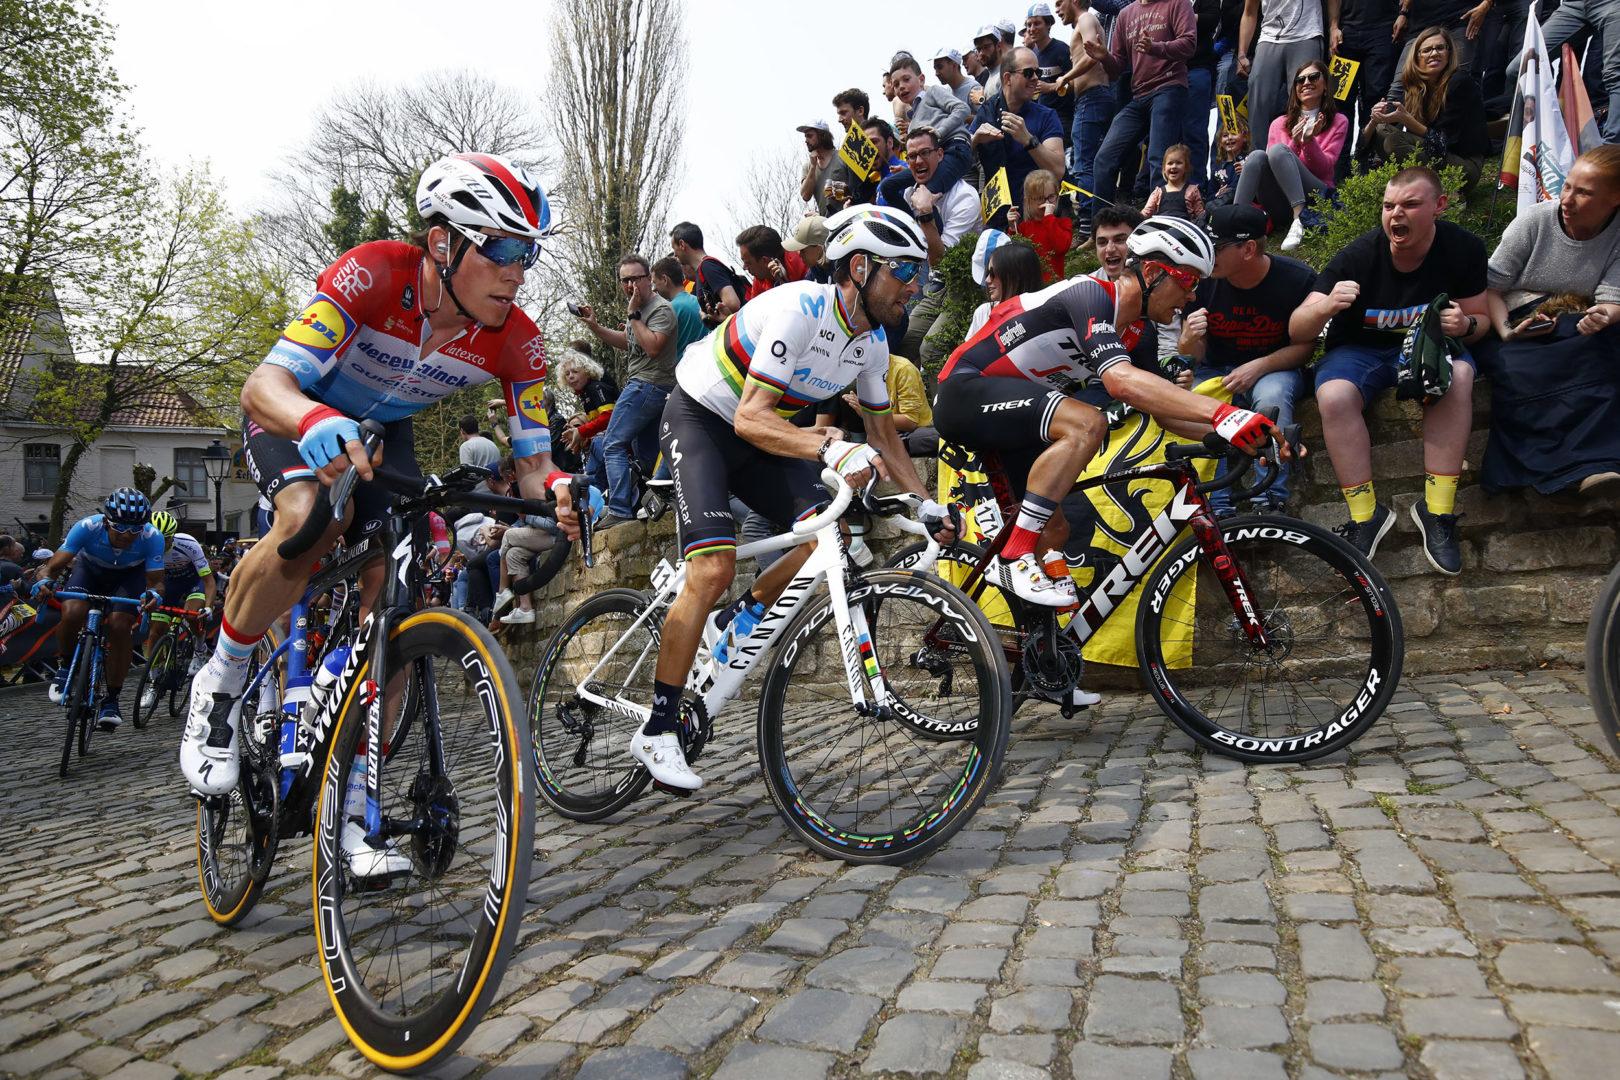 Giro delle Fiandre 2019 - Tour des Flandres  - Ronde van Vlaanderen - Antwerp - Oudenaarde 270 km - 07/04/2019 Grammont - Alejandro Valverde (ESP - Movistar Team) - Bob Jungels (LUX - Deceuninck - Quick Step) - Jasper Stuyven (BEL- Trek - Segafredo) - photo Luca Bettini/BettiniPhoto©2018